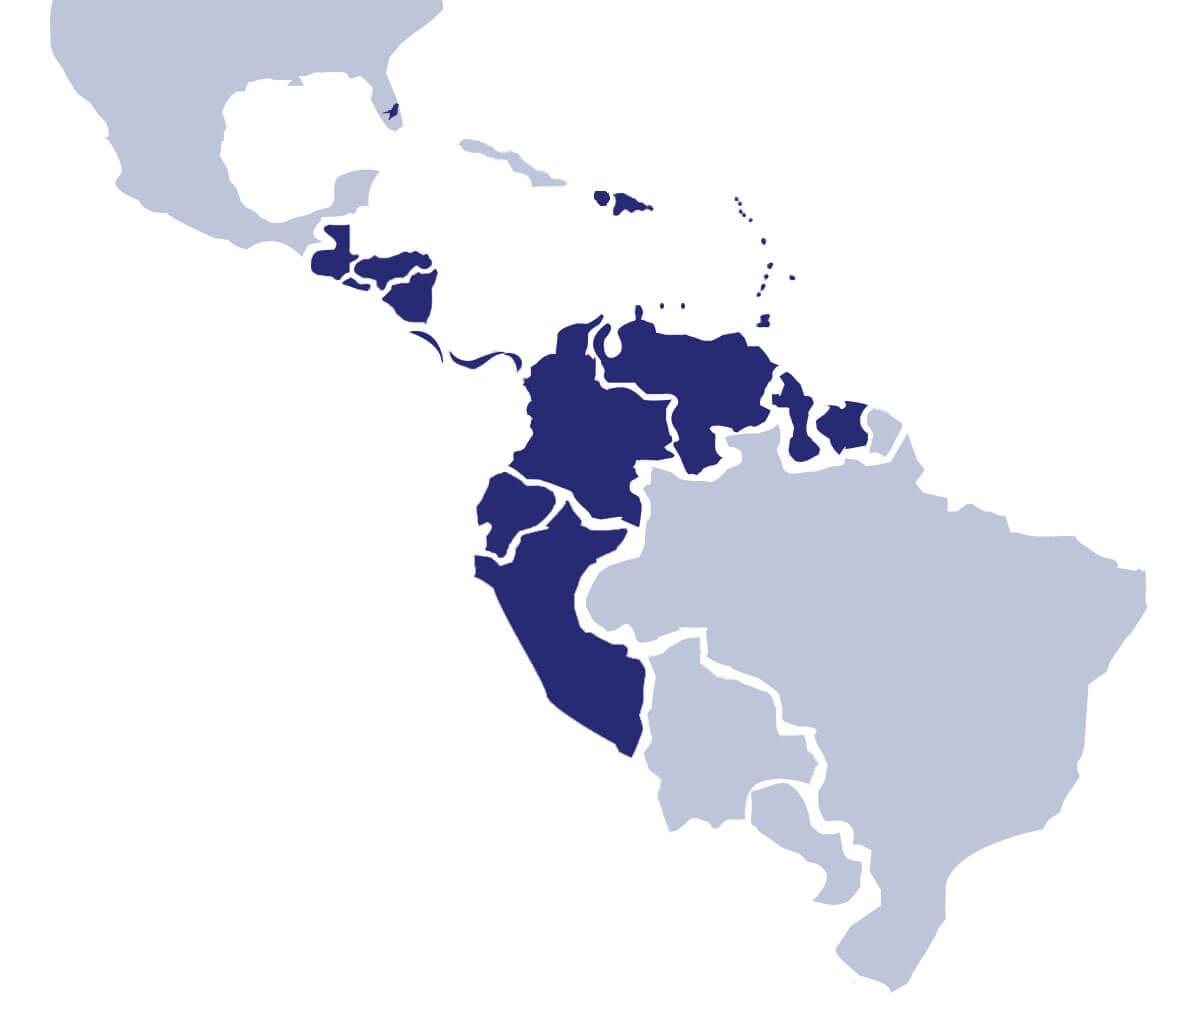 king ocean map